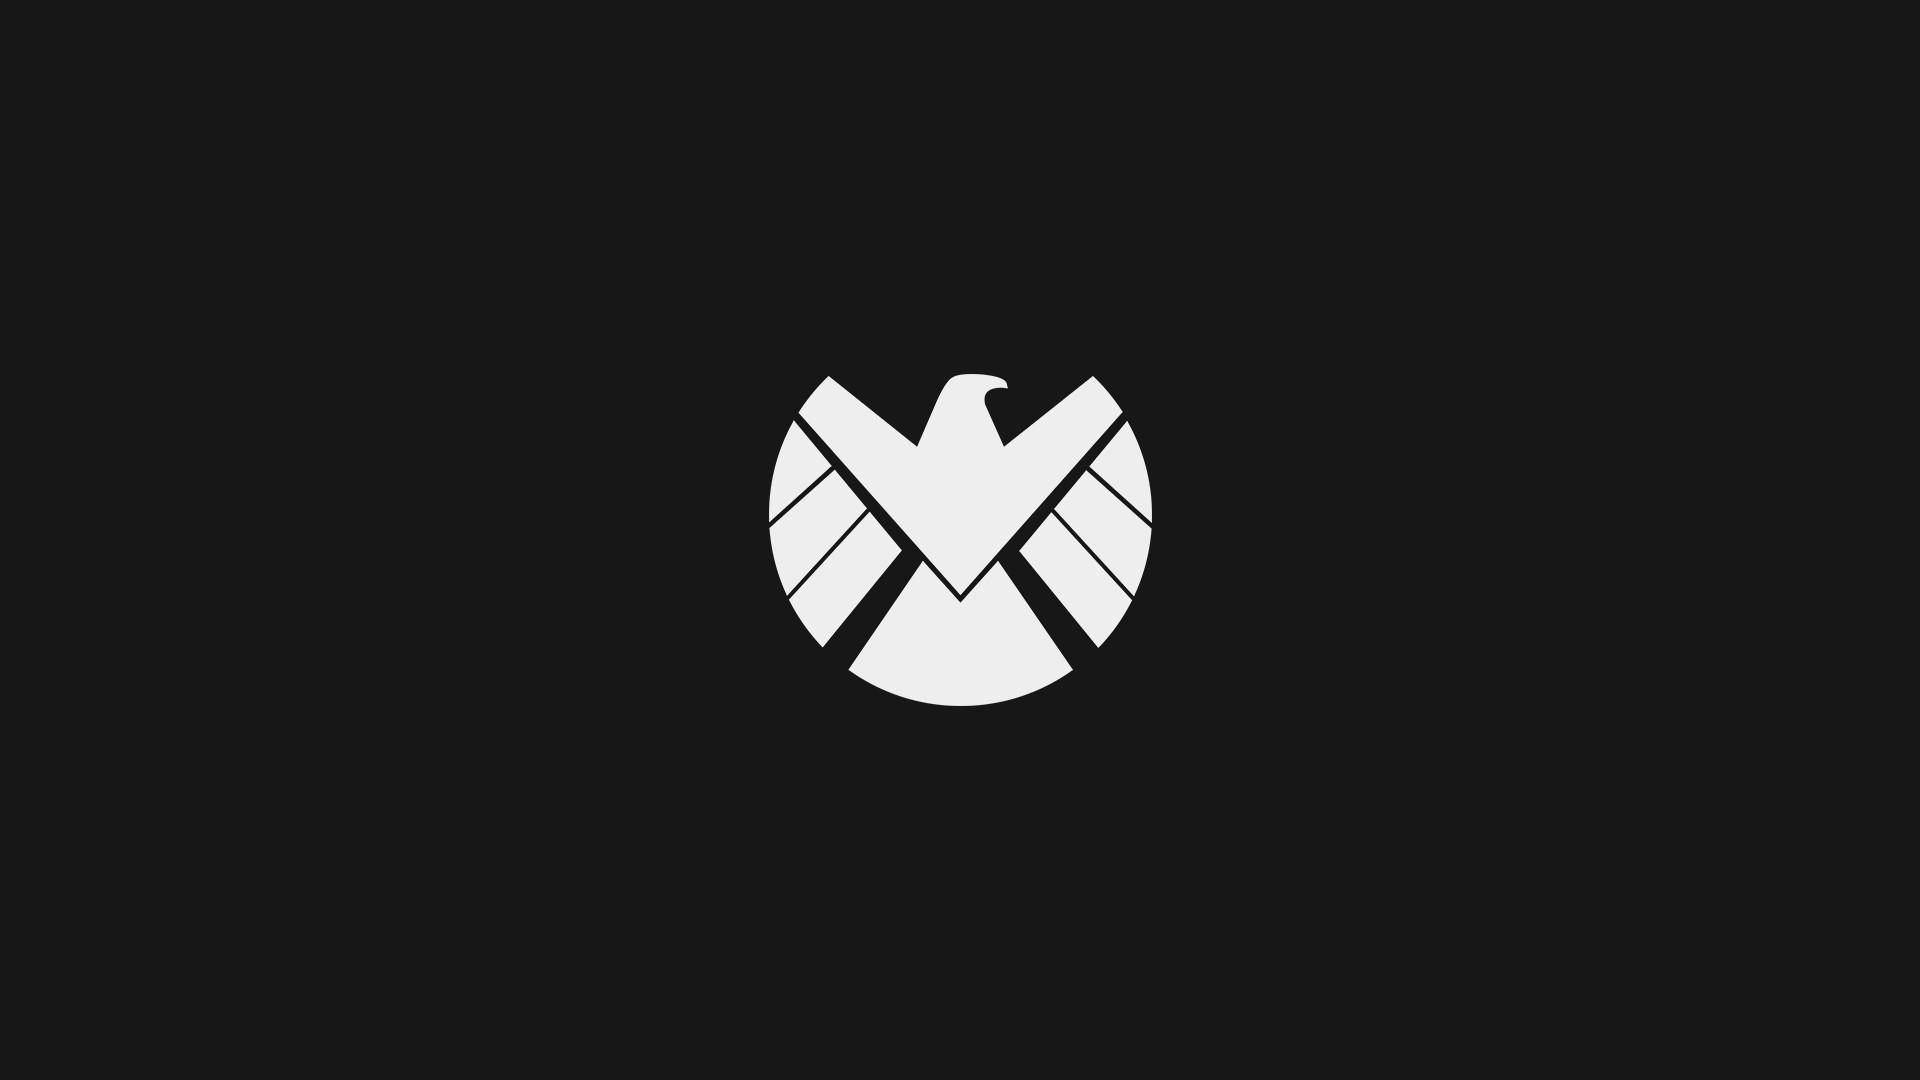 Agents Of S.H.I.E.L.D. Marvel Cinematic Universe 33441 …